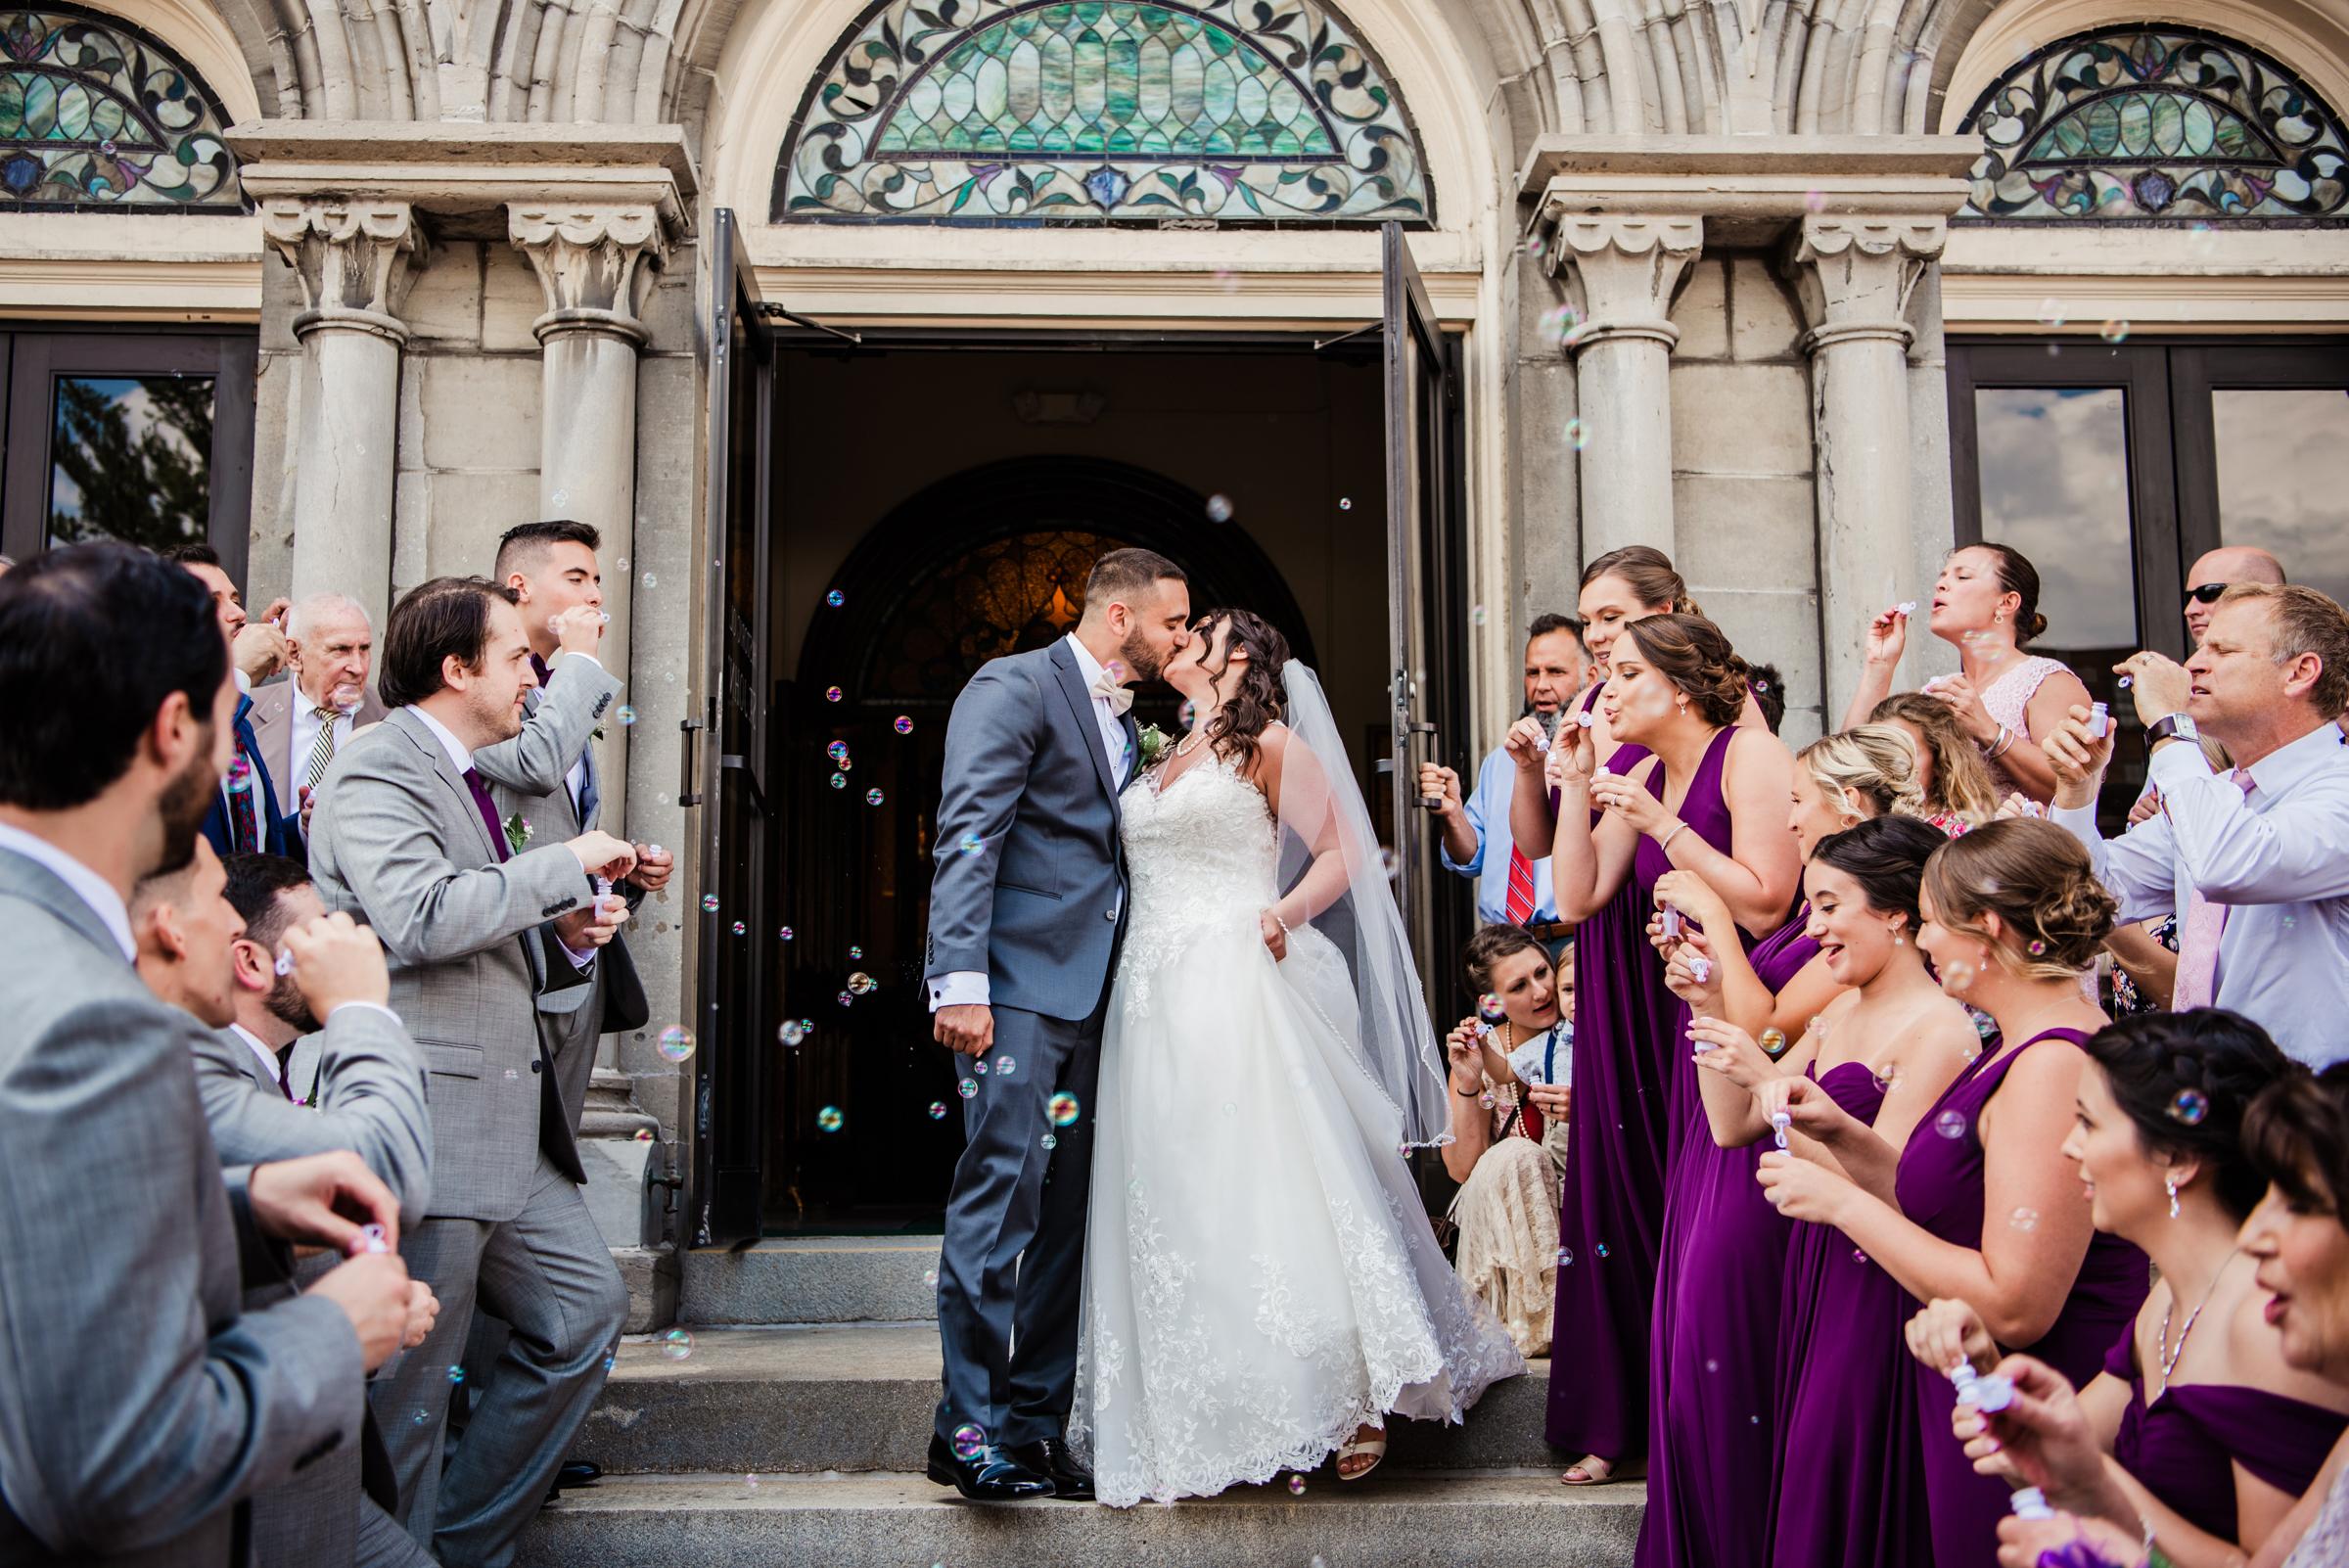 Historic_Old_St_Johns_Church_Valentinos_Banquet_Hall_Central_NY_Wedding_JILL_STUDIO_Rochester_NY_Photographer_DSC_5883.jpg